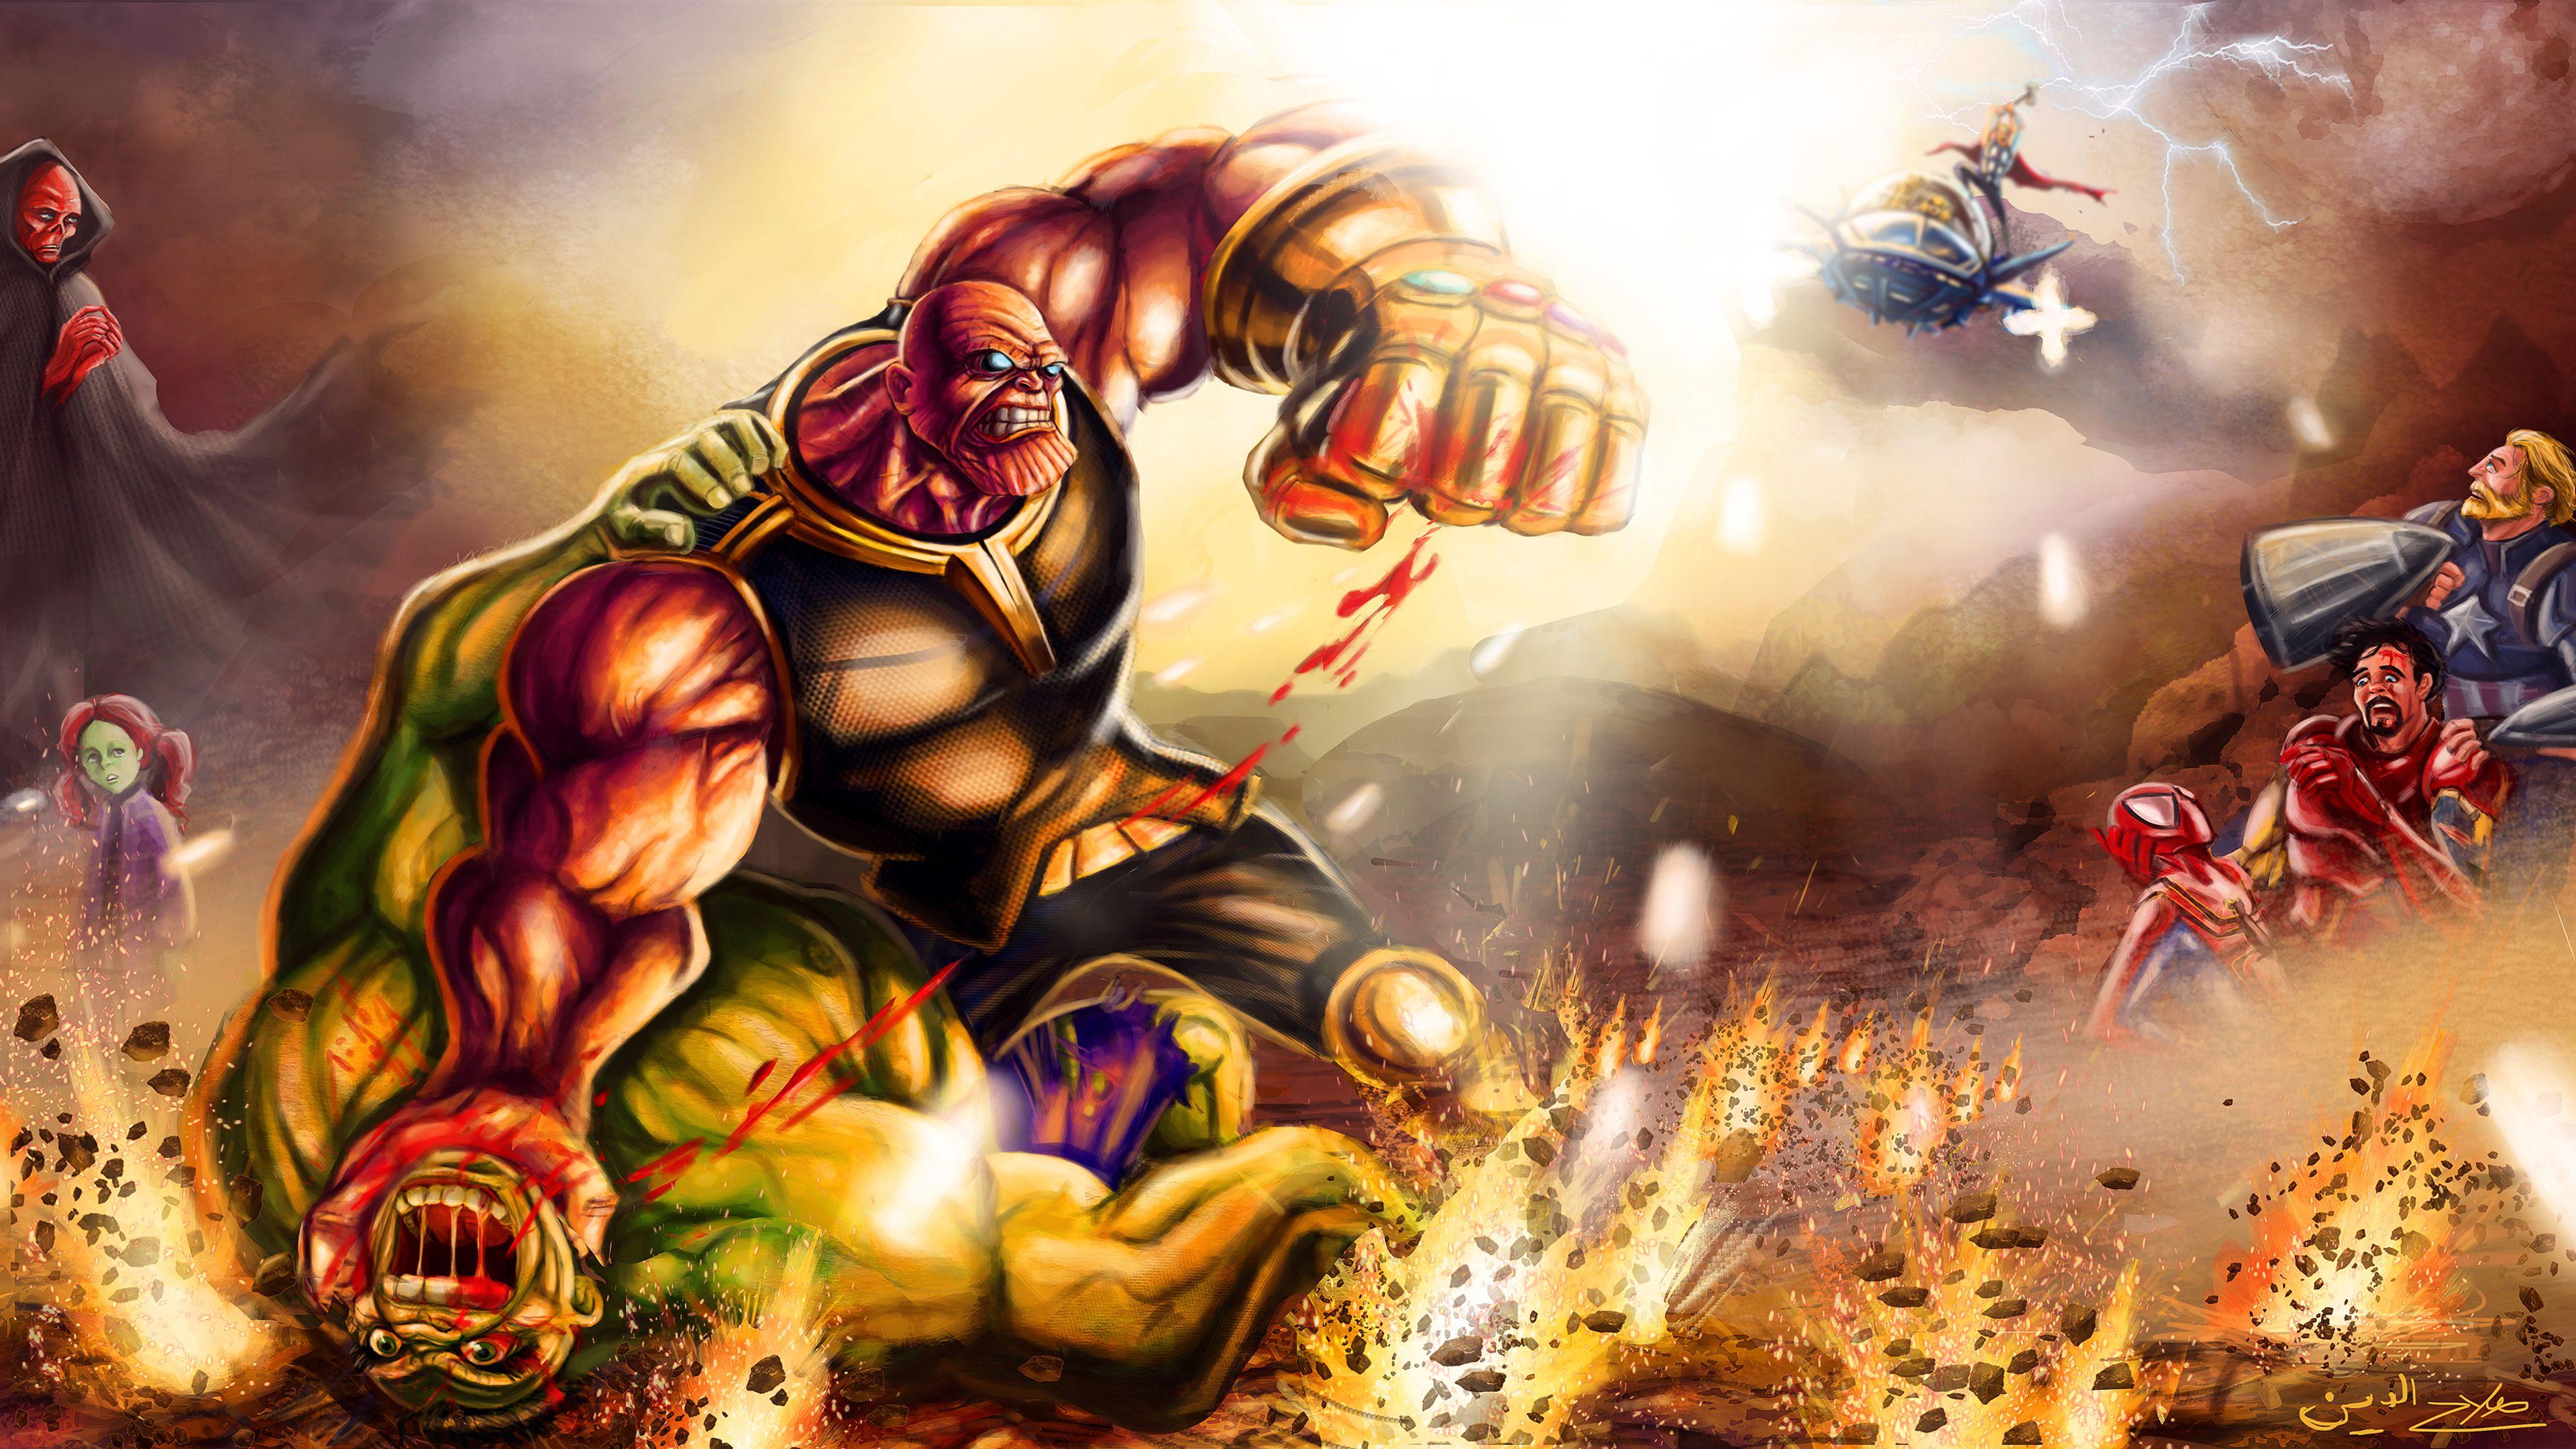 Thanos Defeat Hulk thanos wallpapers superheroes wallpapers hulk 3840x2160